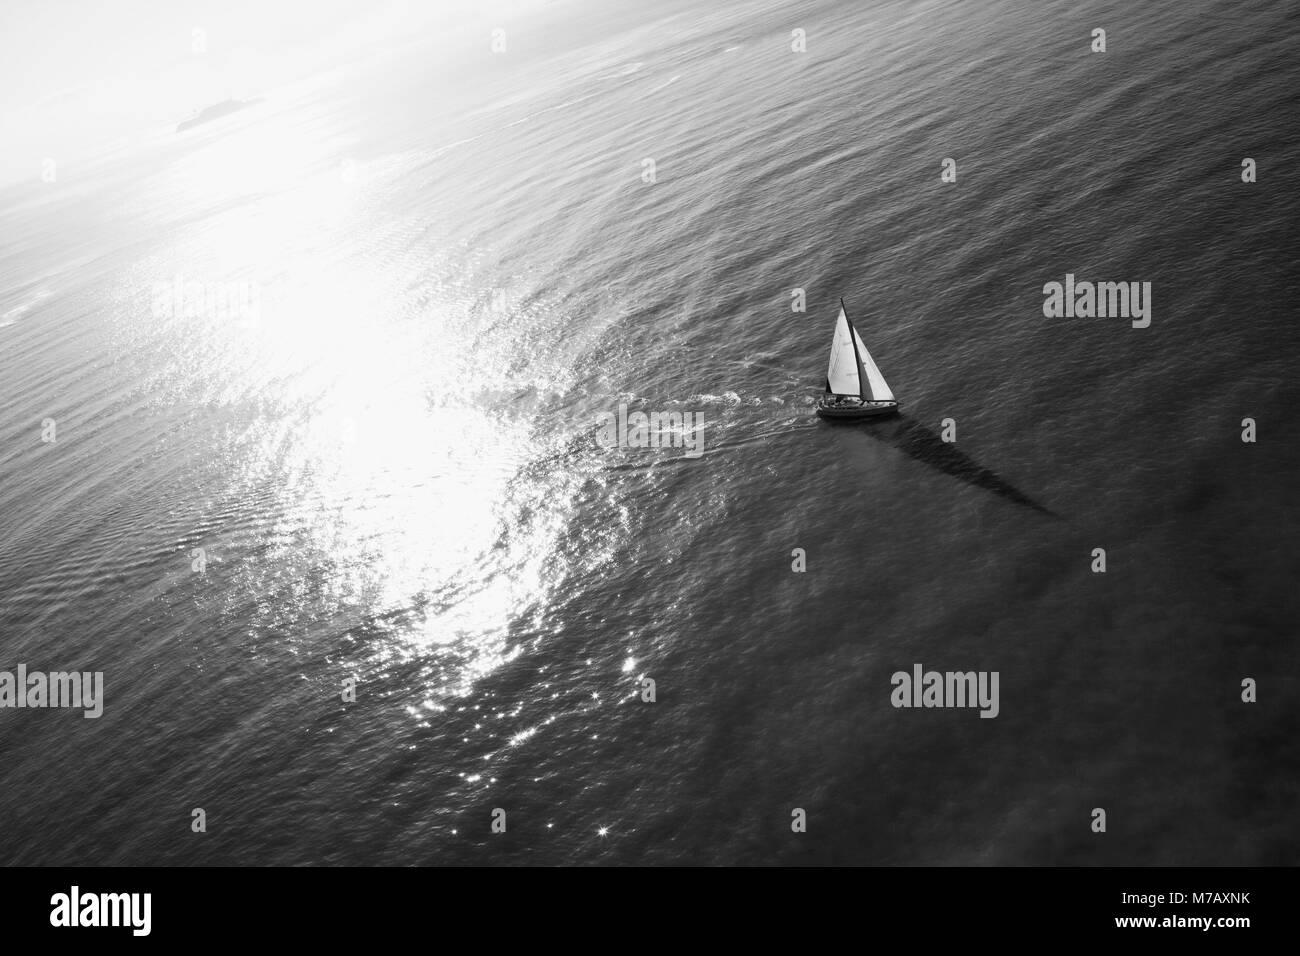 Sailboat in the sea, San Francisco, California, USA - Stock Image